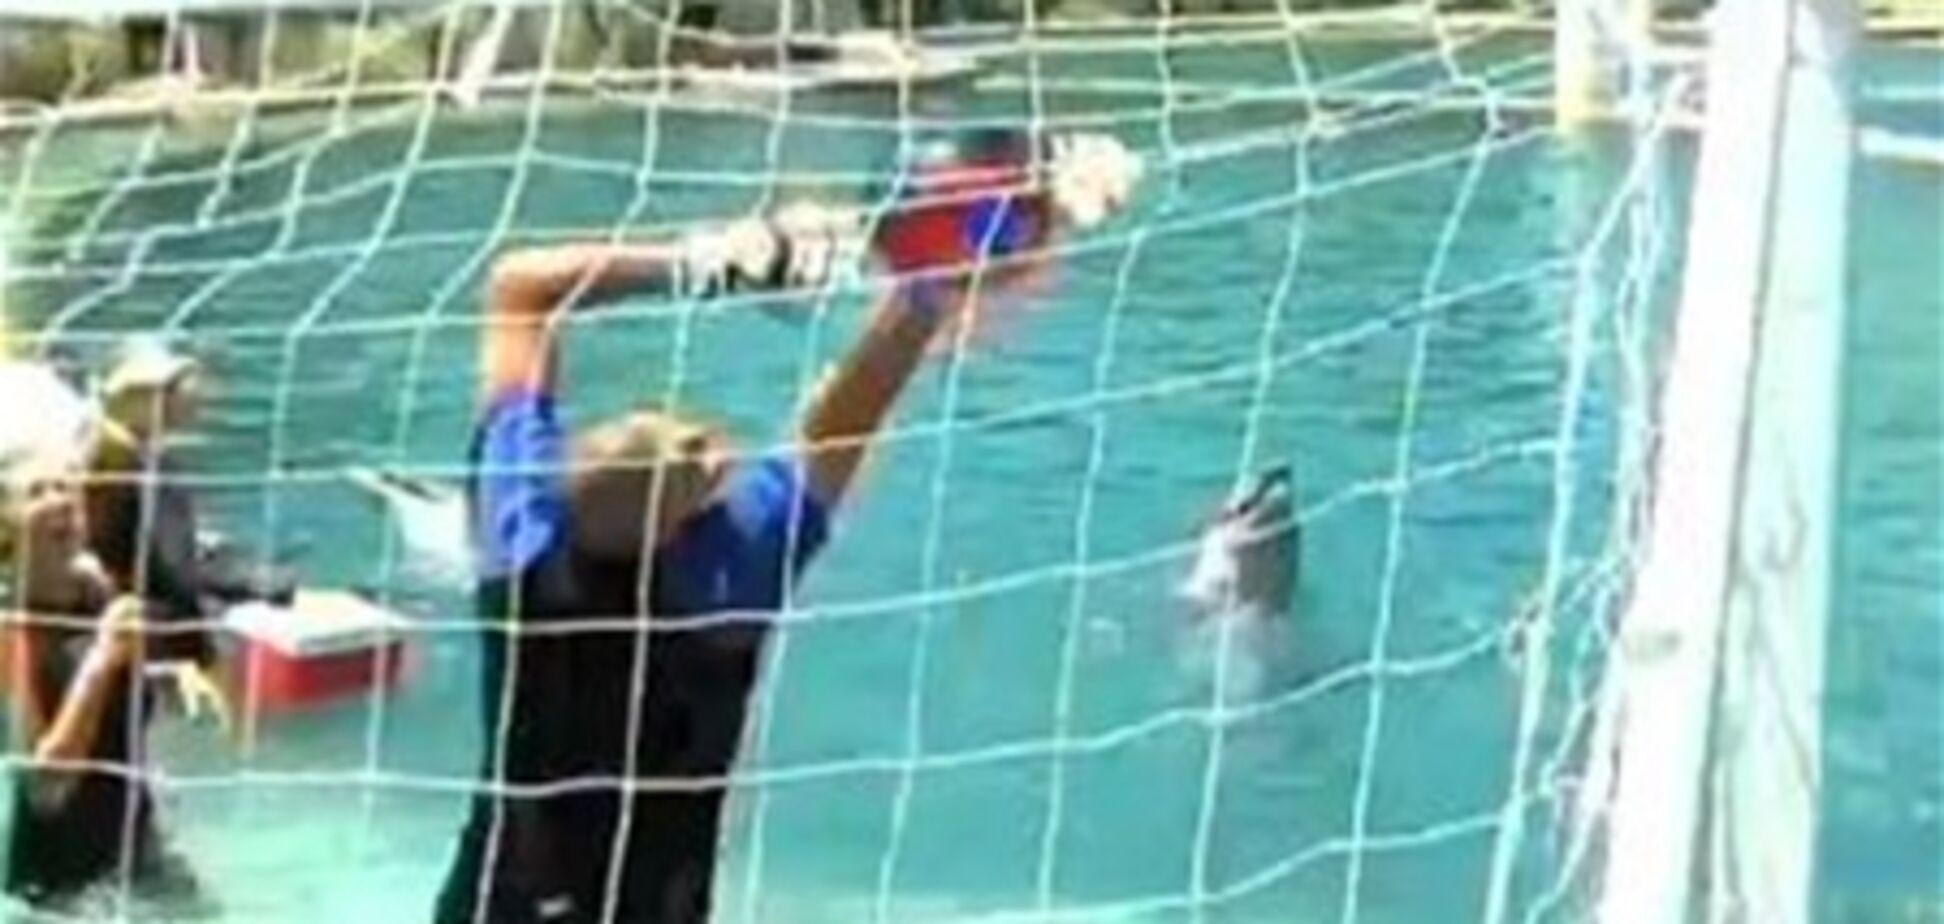 Дельфин забил гол вратарю 'Барселоны'